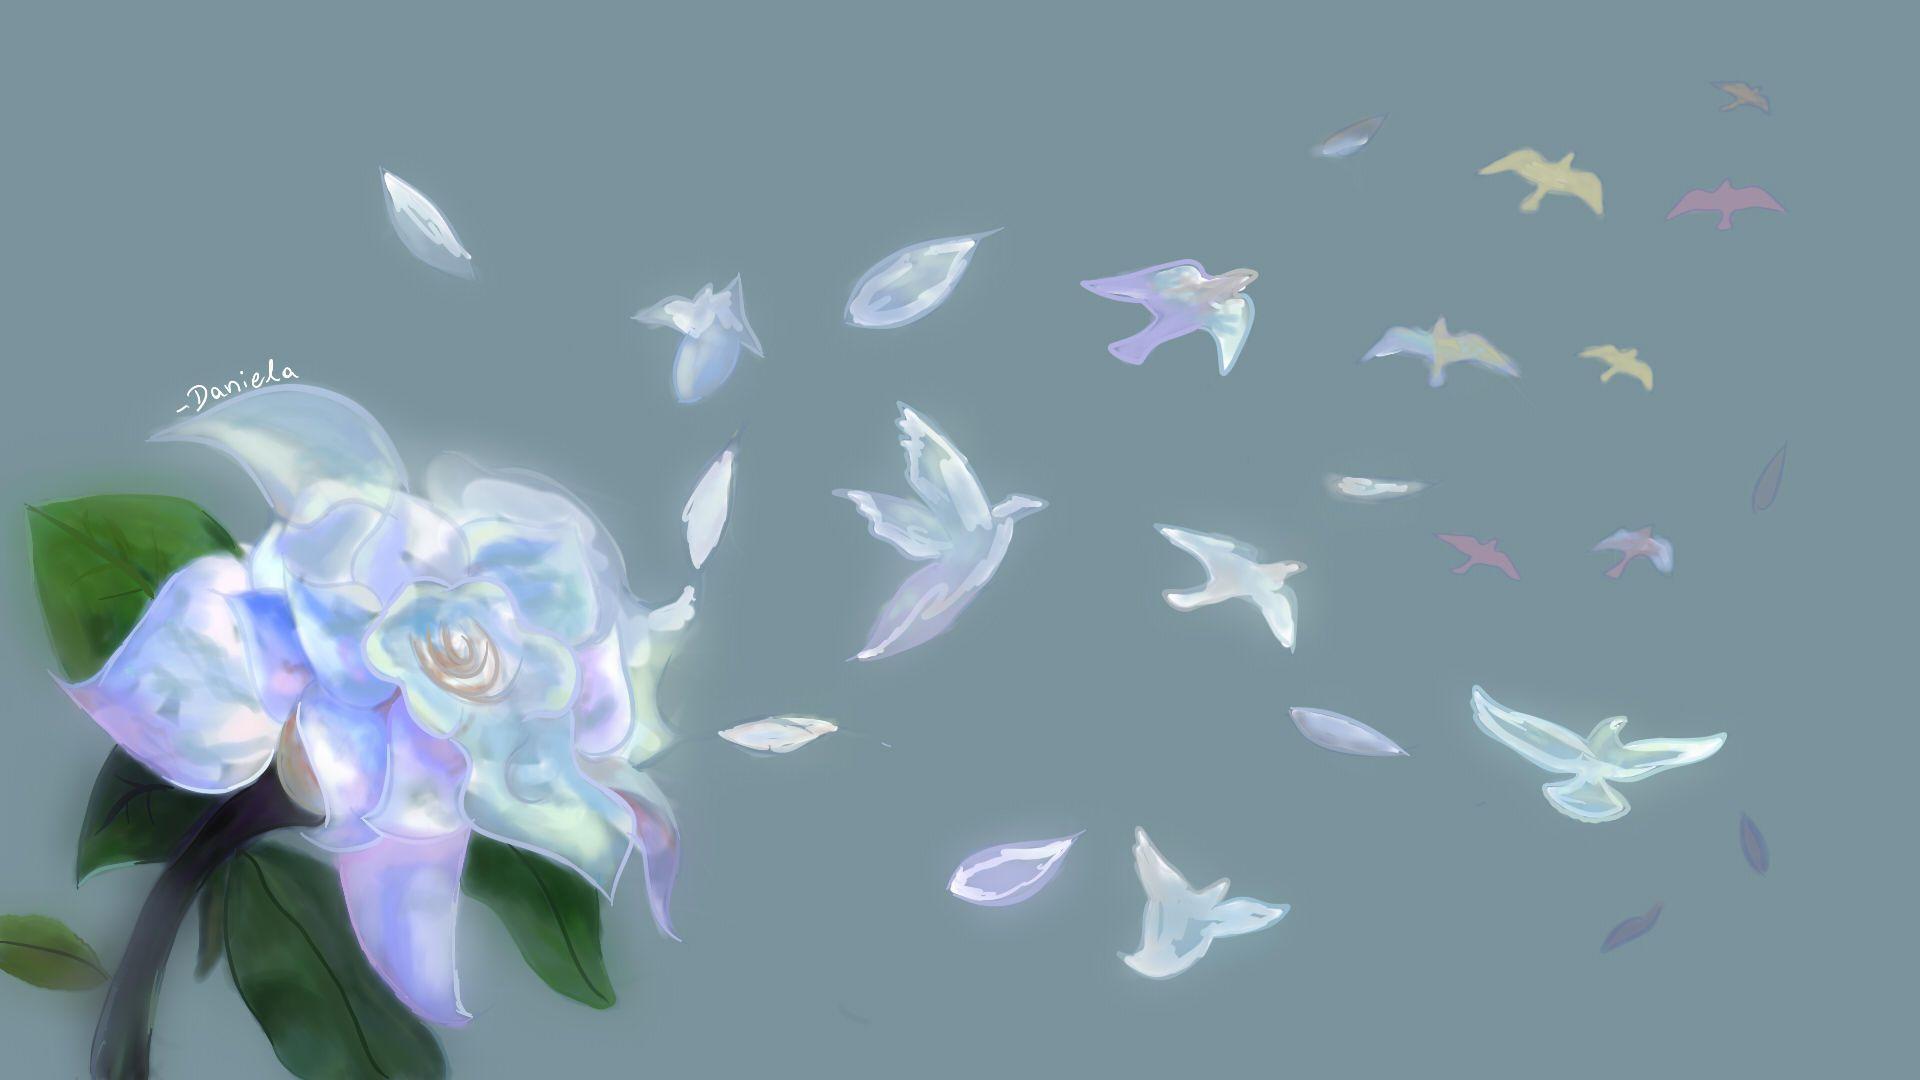 Smeraldo Flower Wallpaper Best Flower Site